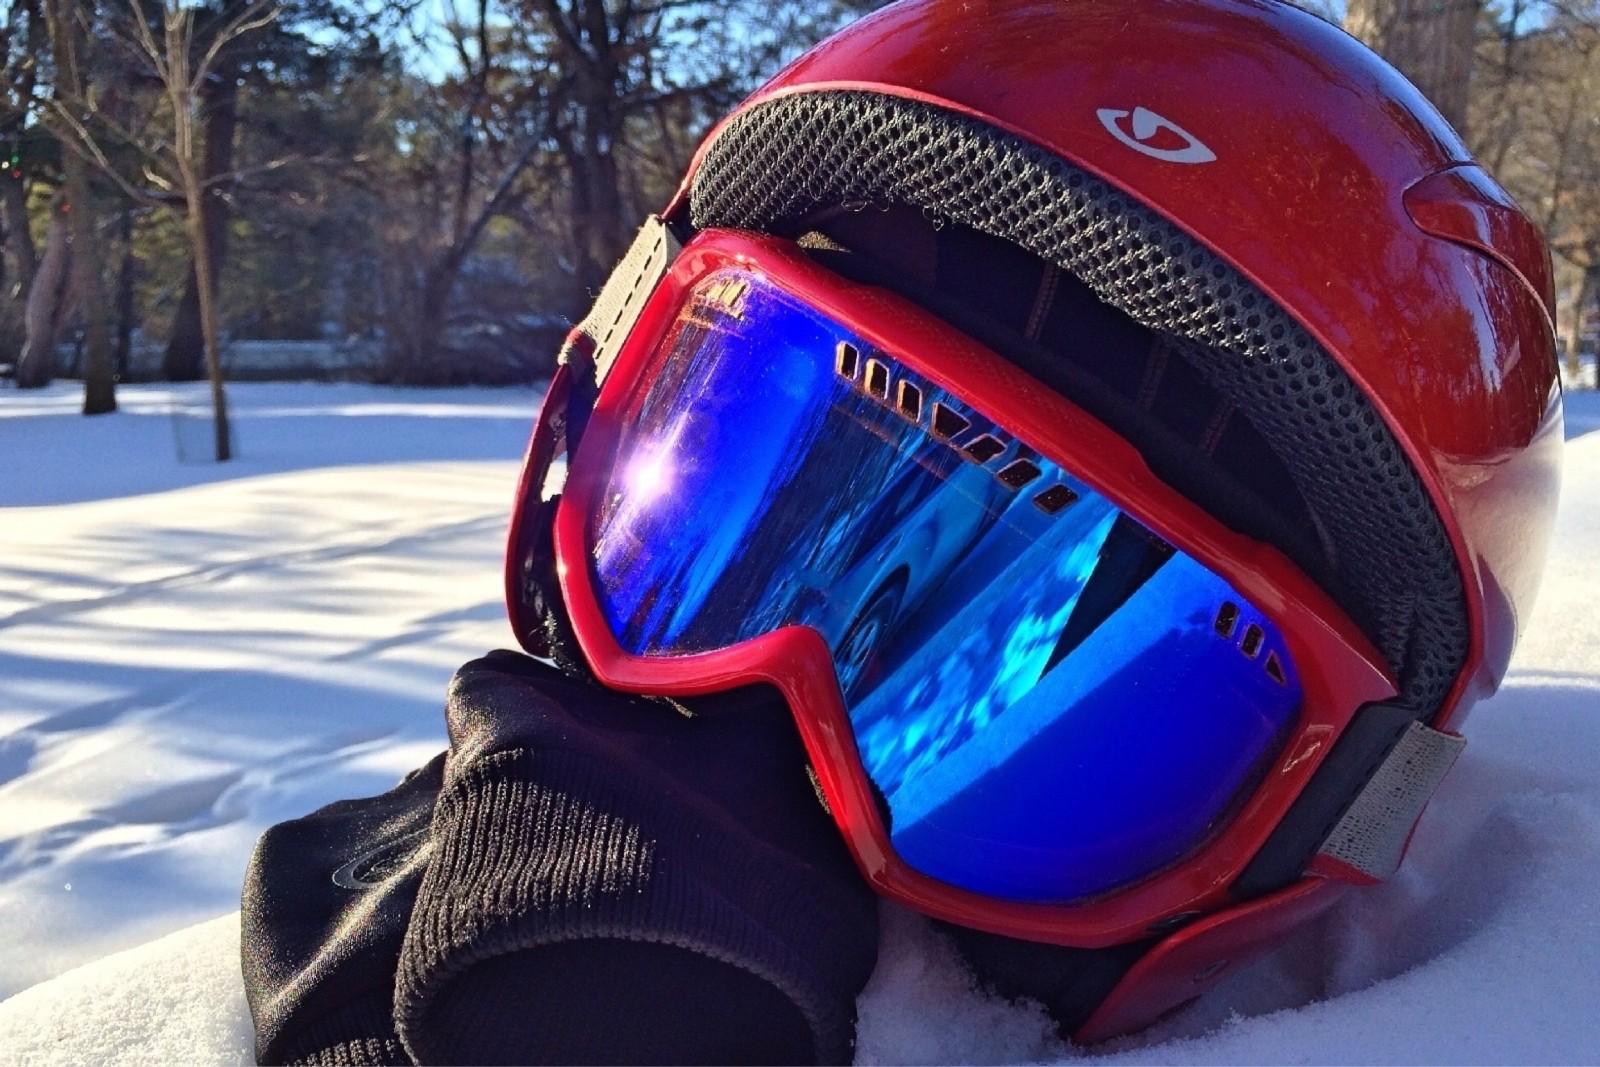 ski-snowboard-winter-snow-sport-snowboarding